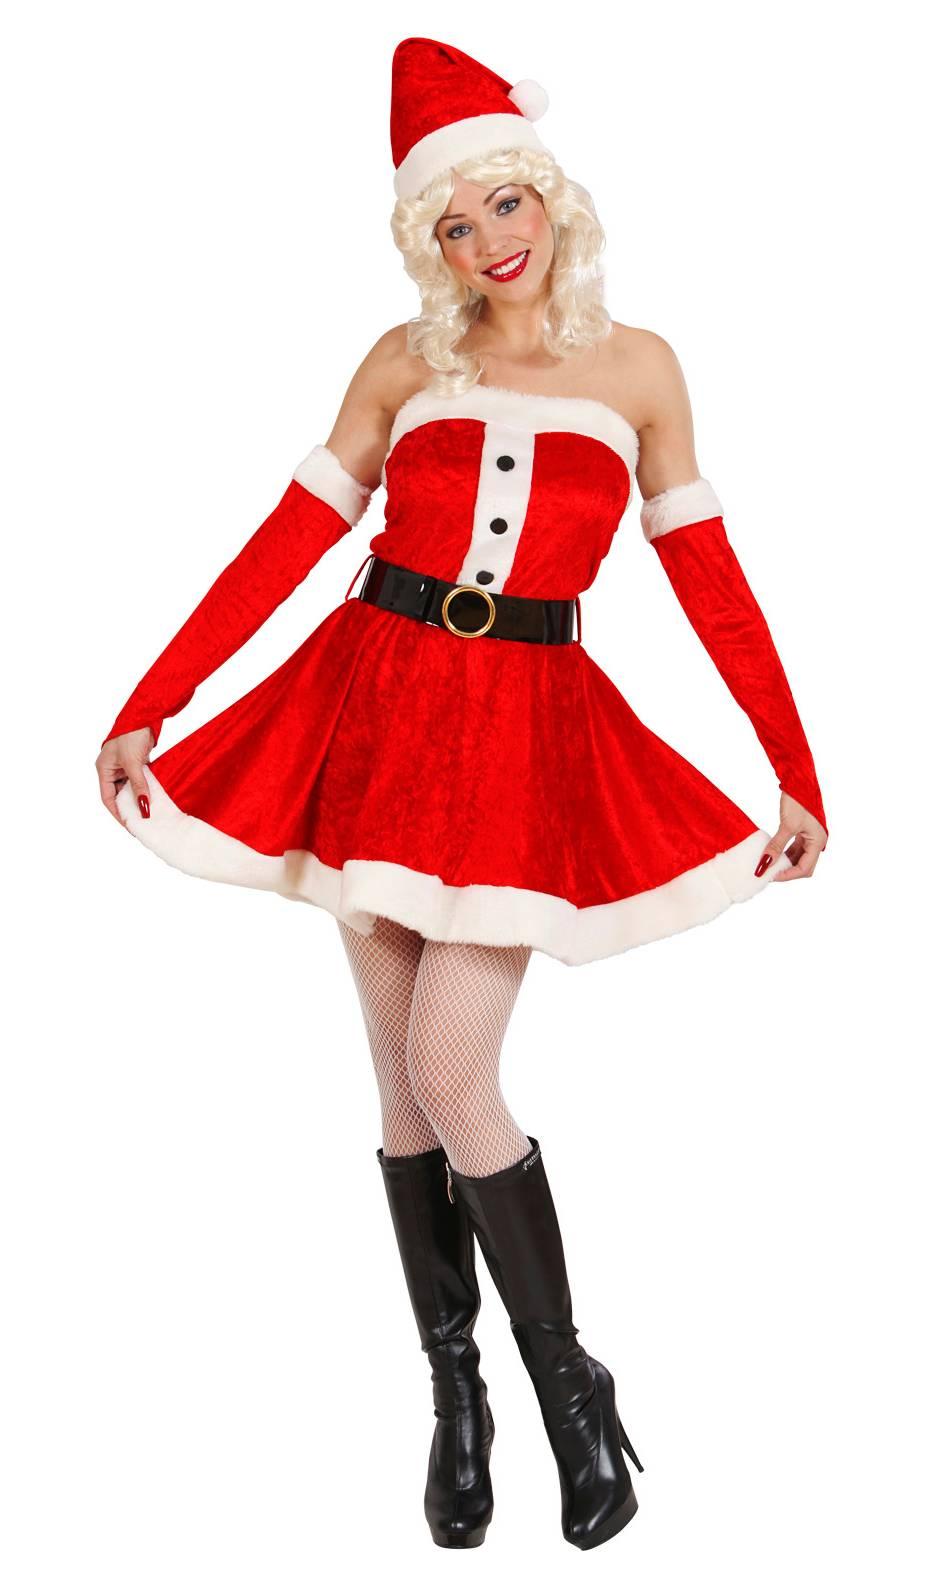 Costume-Mère-Noël-Grande-Taille-XL